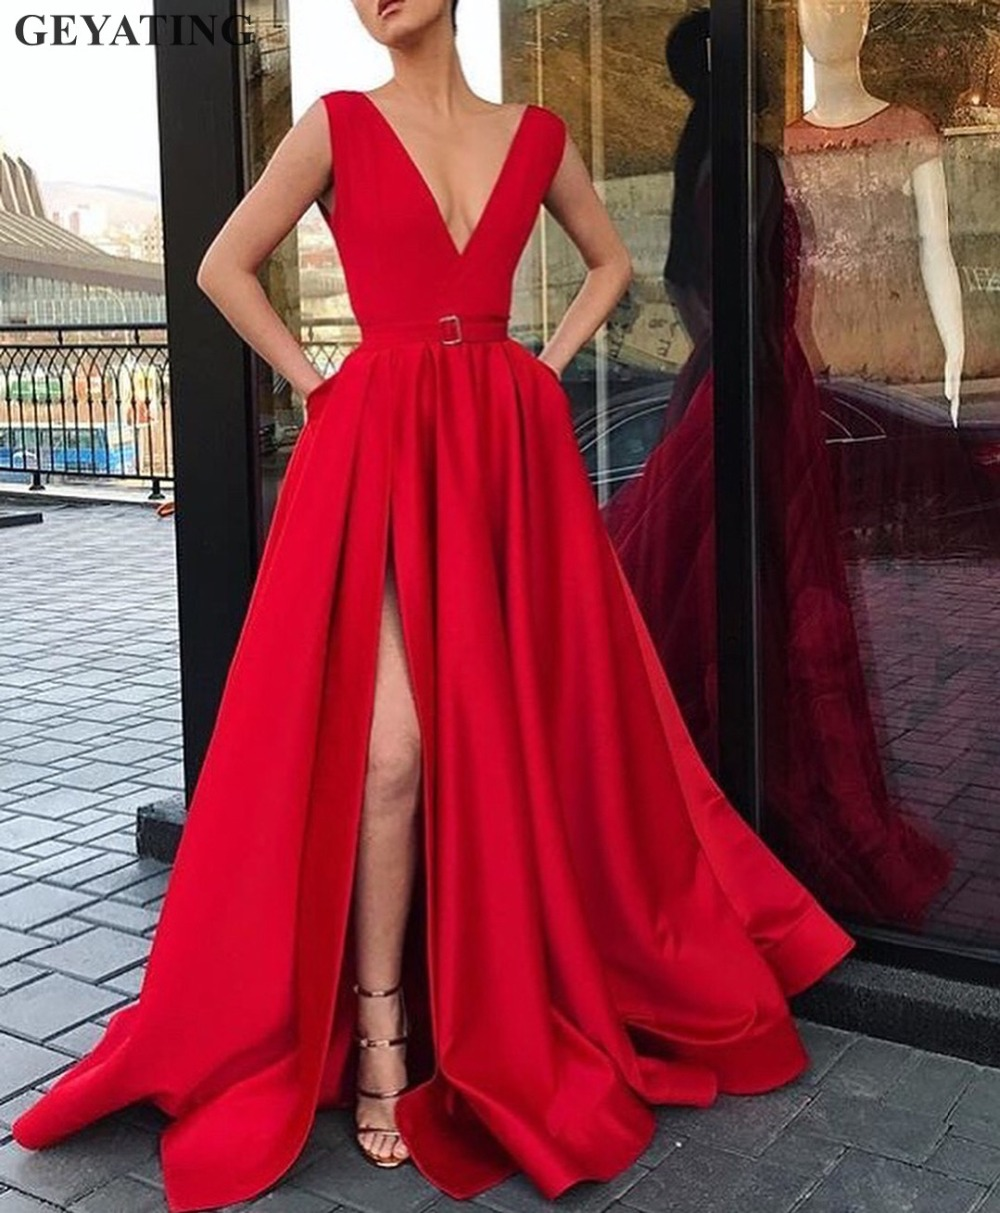 9e9f3f3c4 Women Long Elegant Evening Dress Sexy Side Split Cream Satin Off the Shoulder  Junior Prom Dresses 2019 Vestifos largos de fiesta on Aliexpress.com |  Alibaba ...